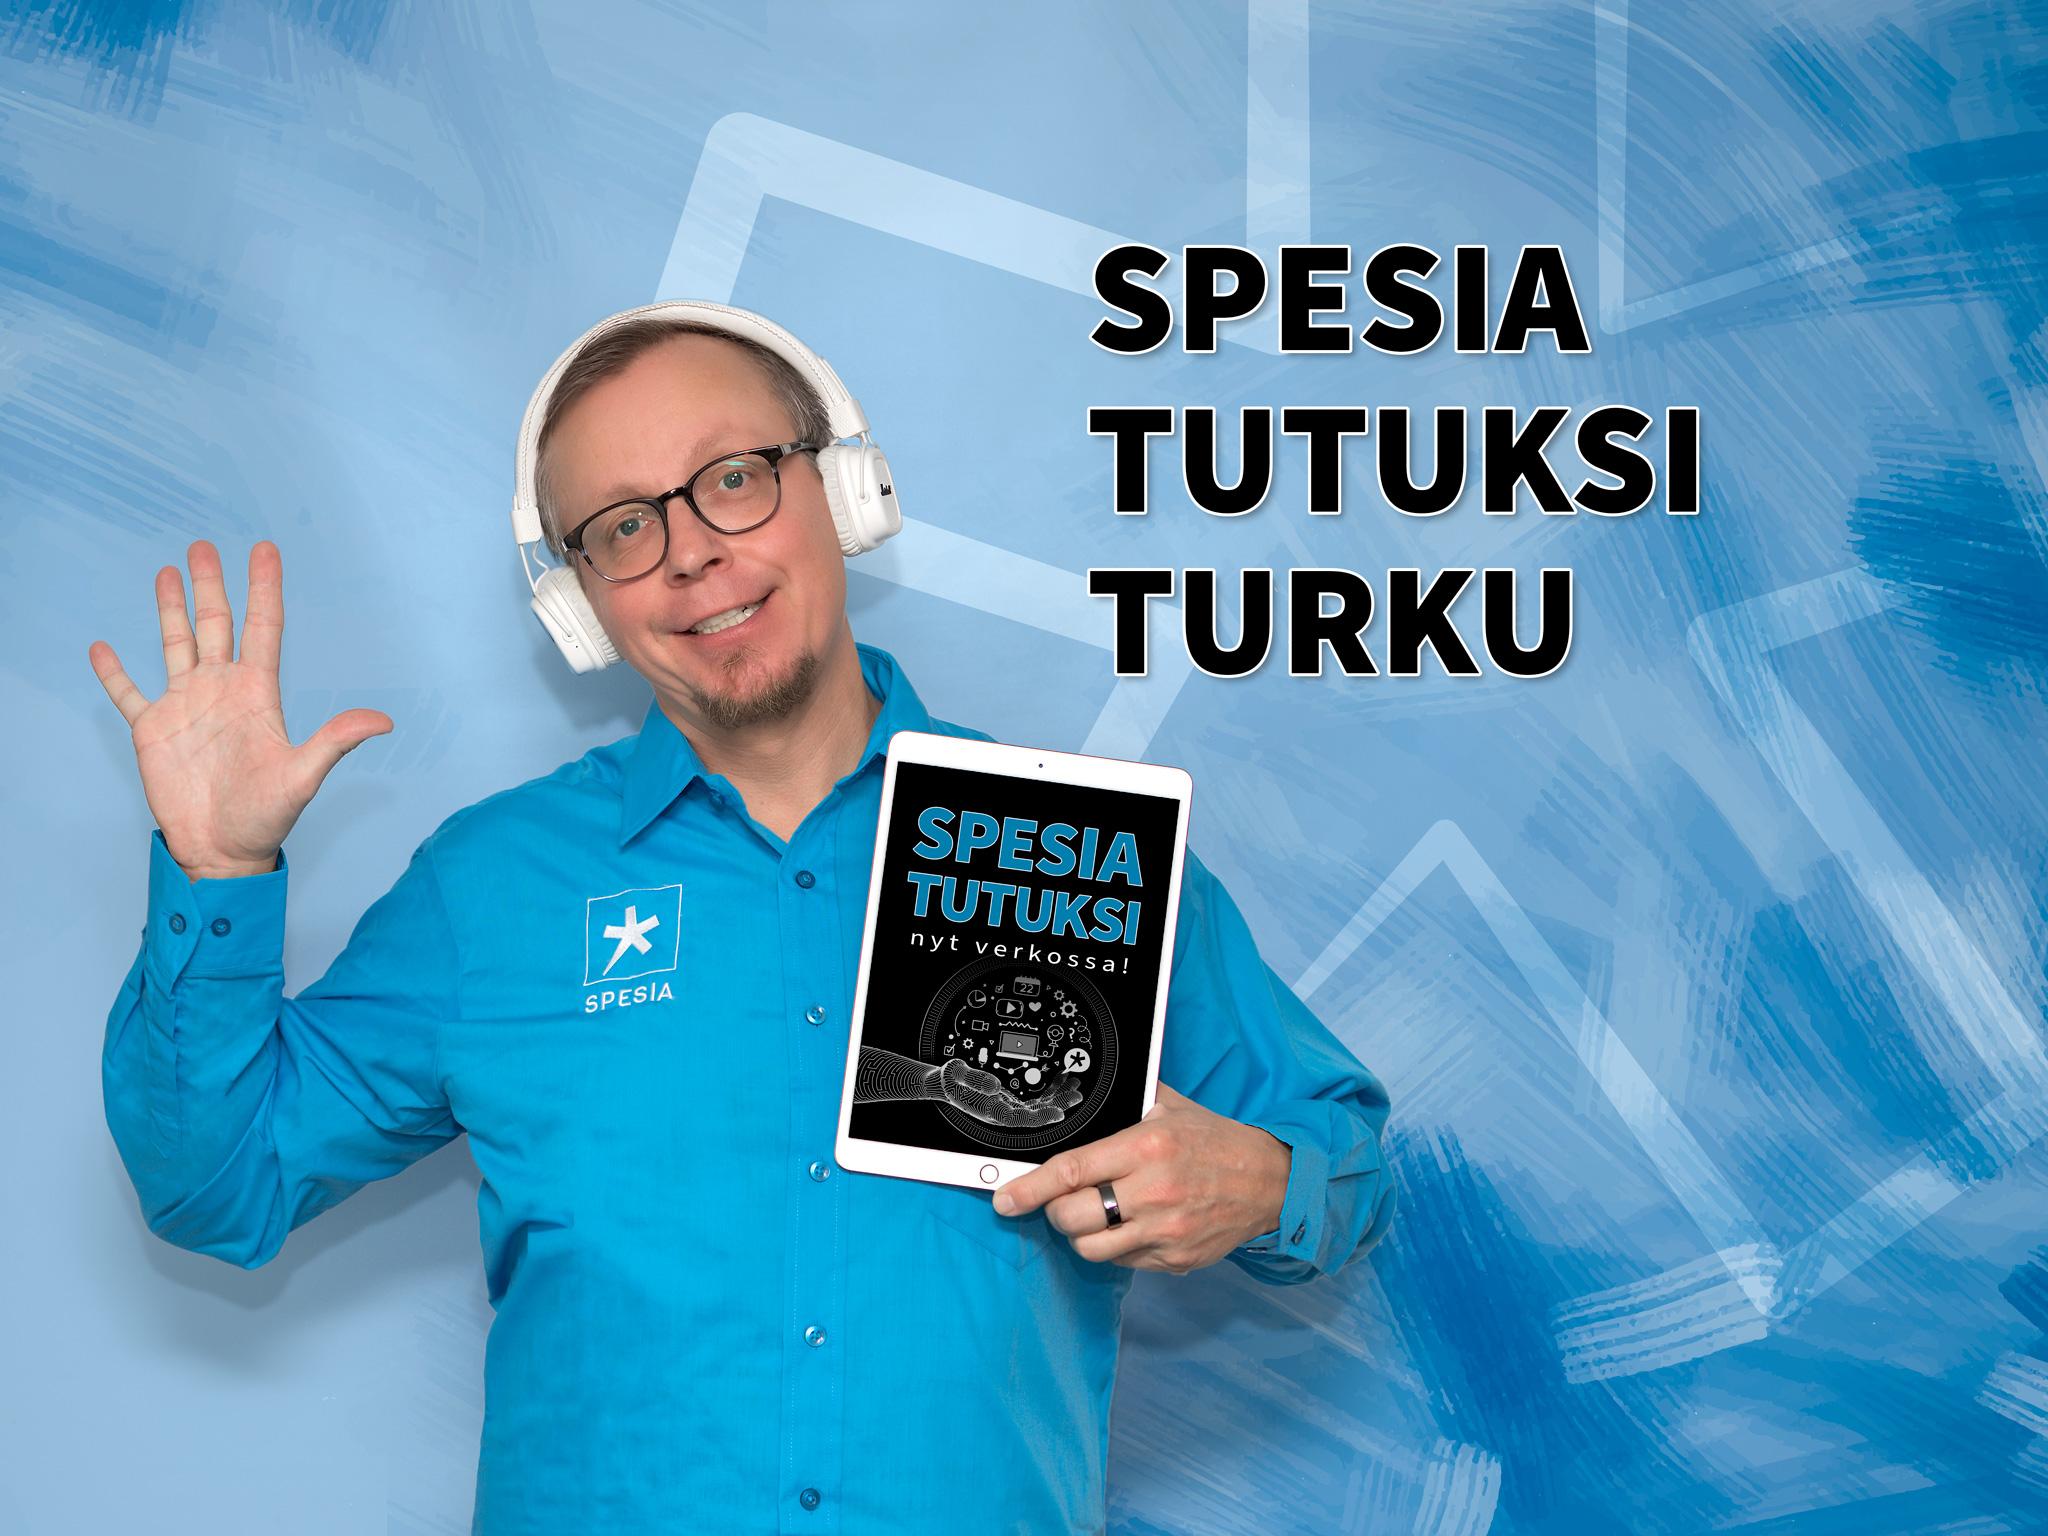 Spesia tutuksi Turku